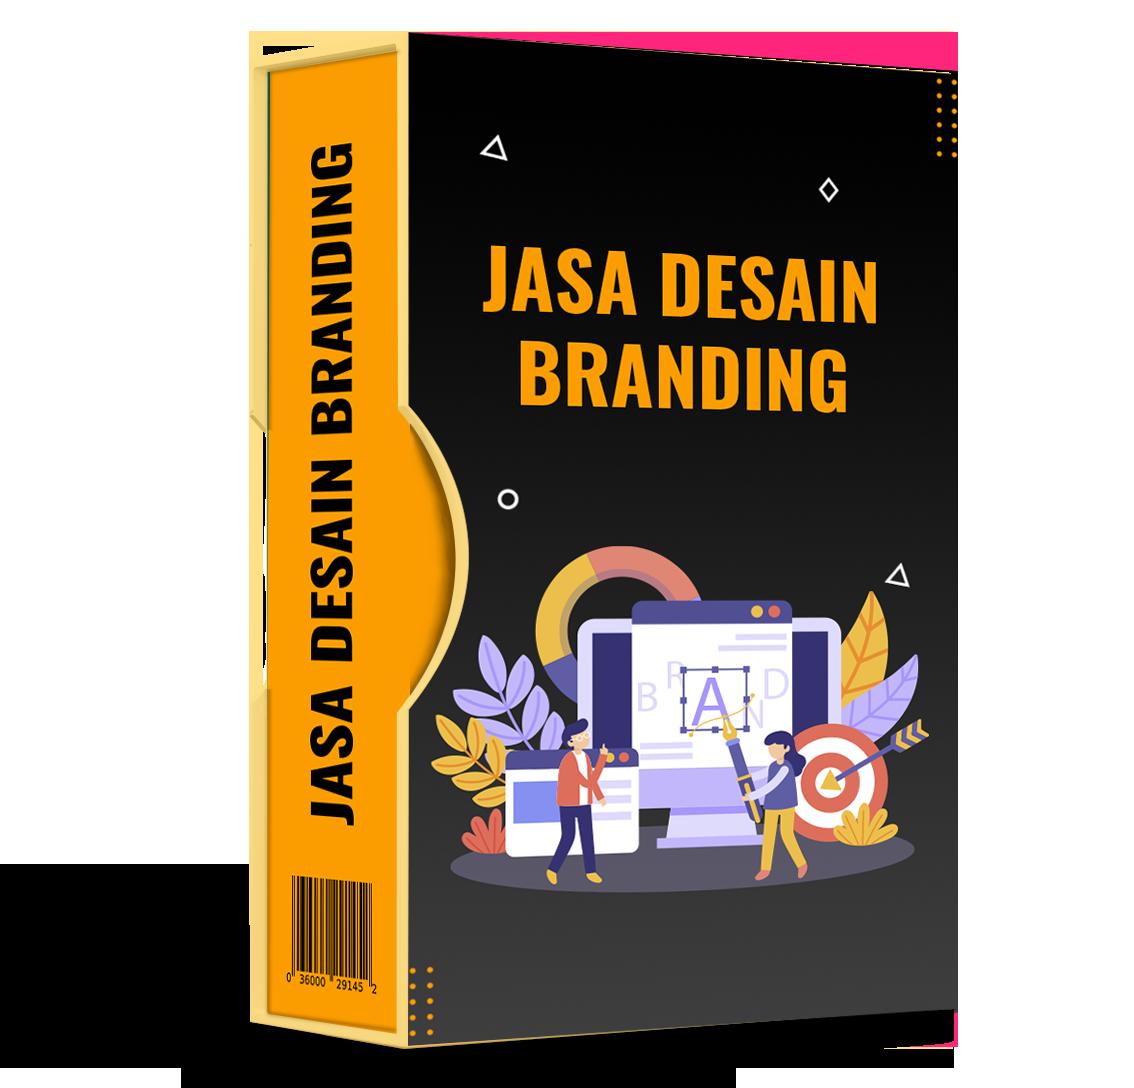 Jasa desain branding